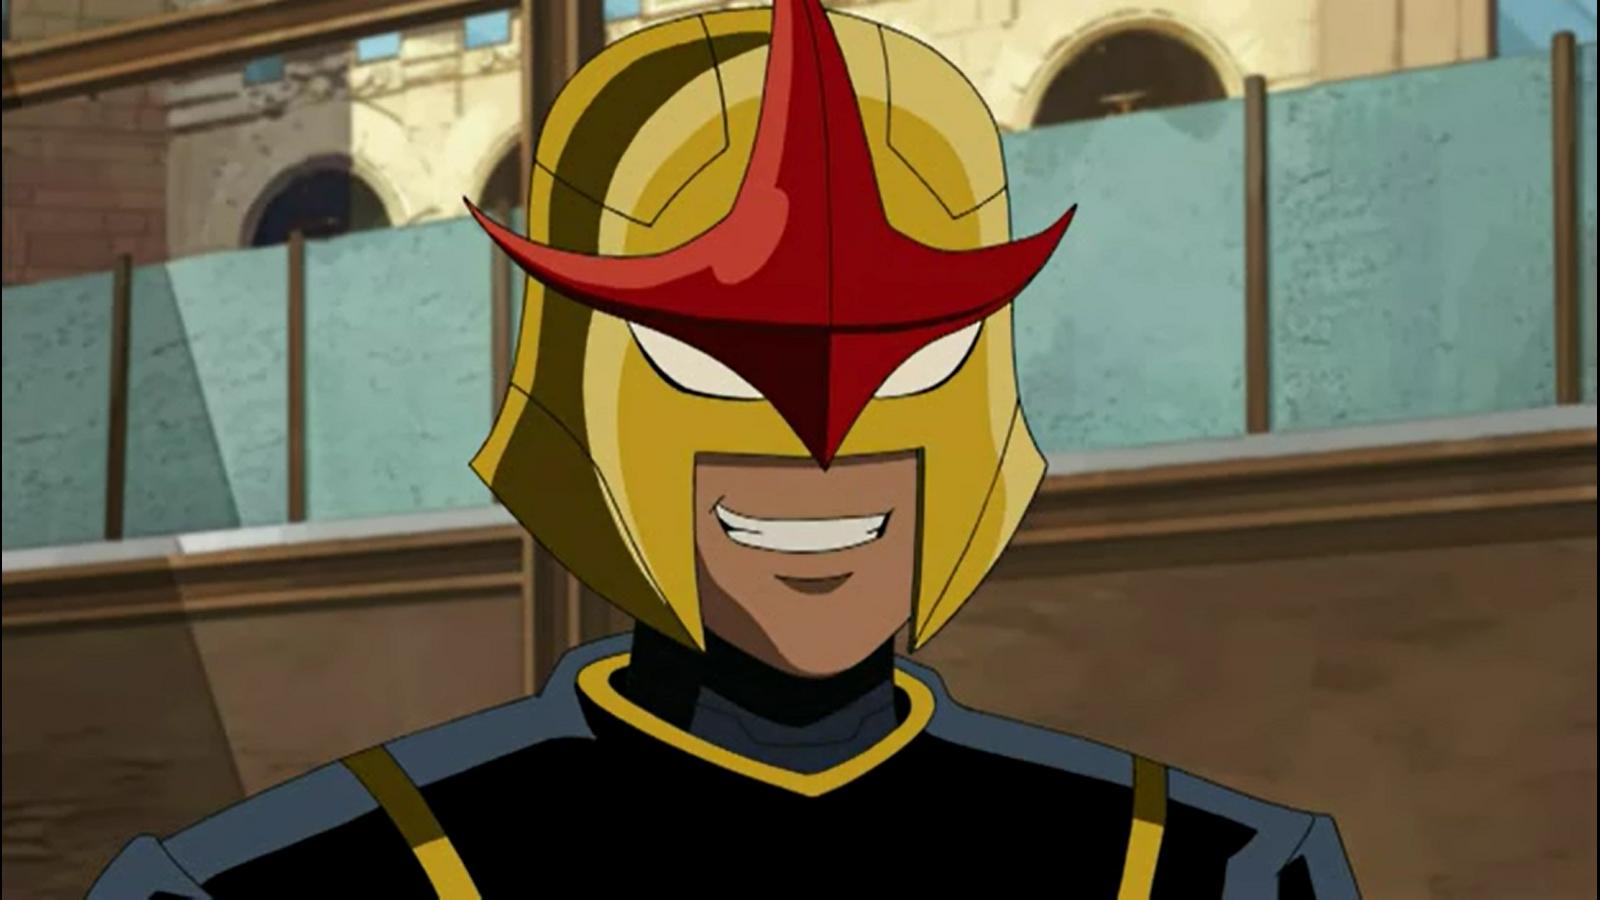 Nova ultimate spider man wiki - photo#3